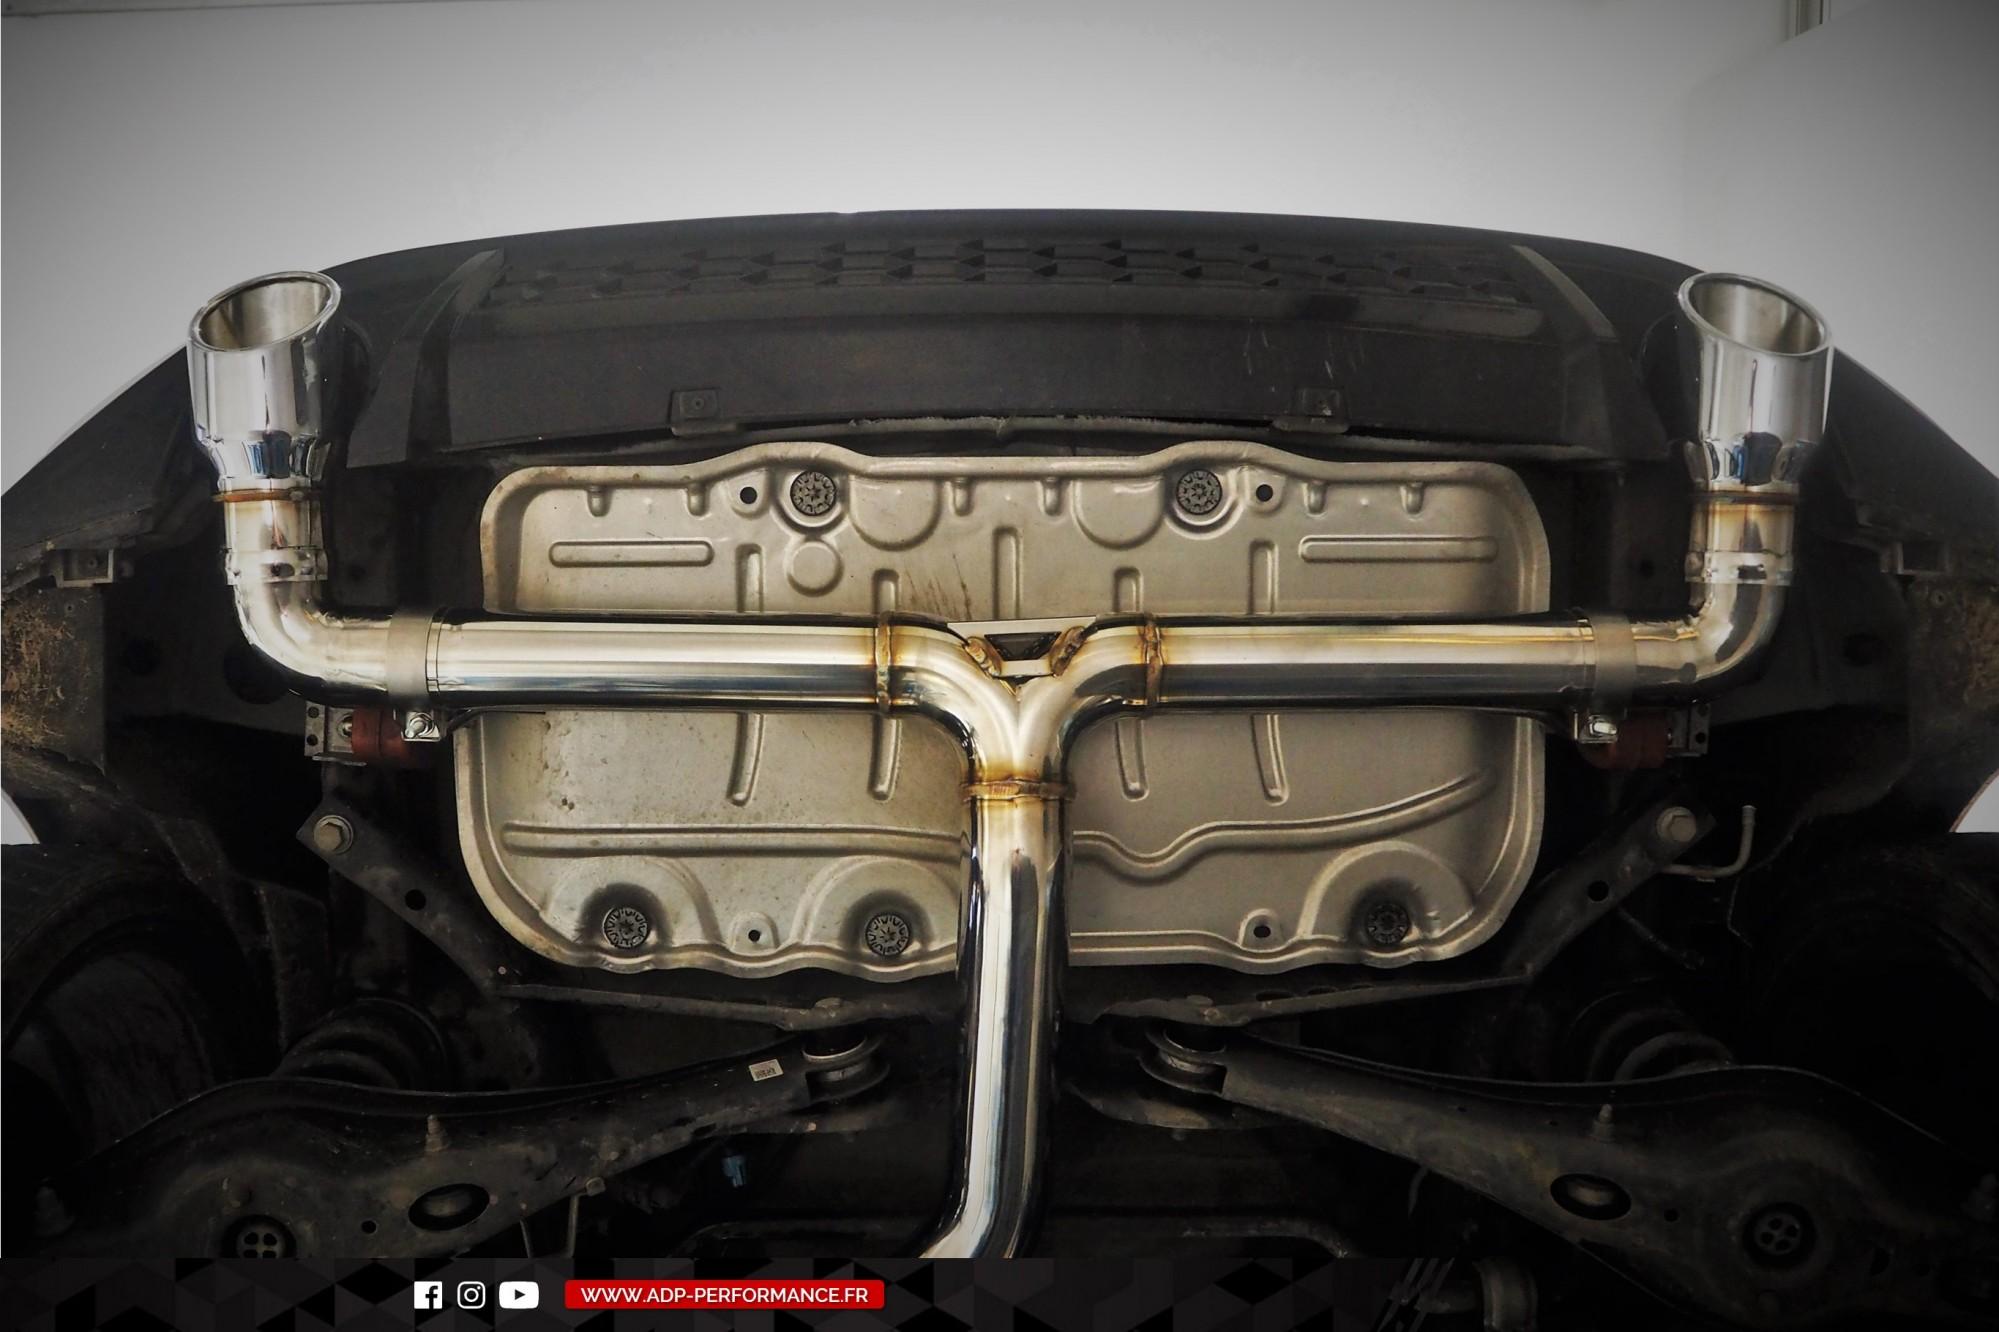 Ligne d'échappement iPE Innotech Istres- VW Golf 7 GTI Performance 2.0 TSI 230cv - ADP Performance